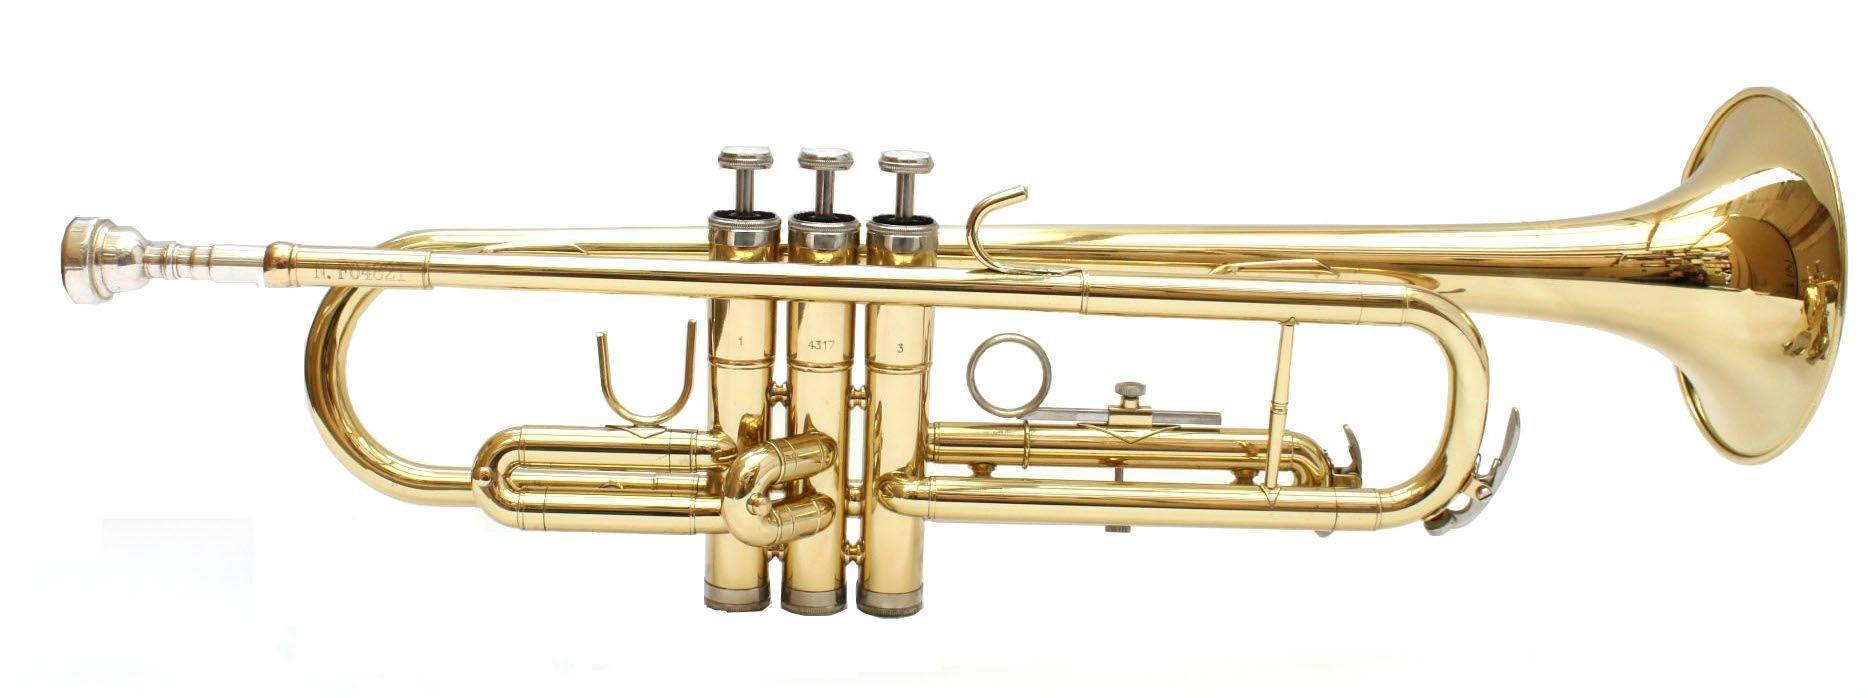 SWING TR-201 B-Trompete lackiert, Bohrung 11,66mm, incl.Etui u. Zubehör